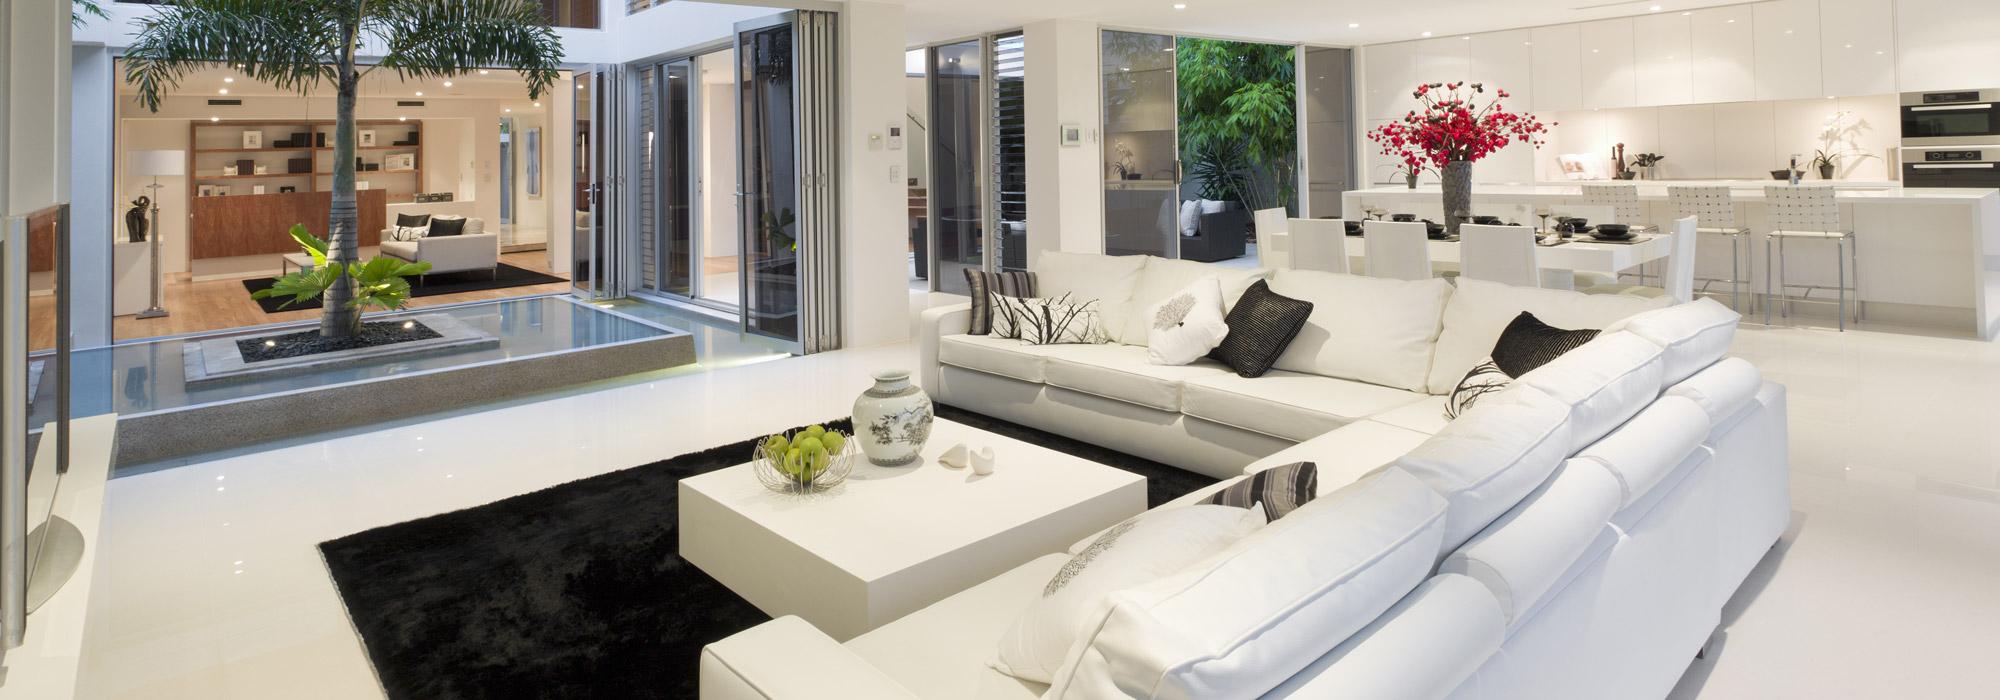 Appartement T4 – 184,85 M² – 1 500 € – Cayenne